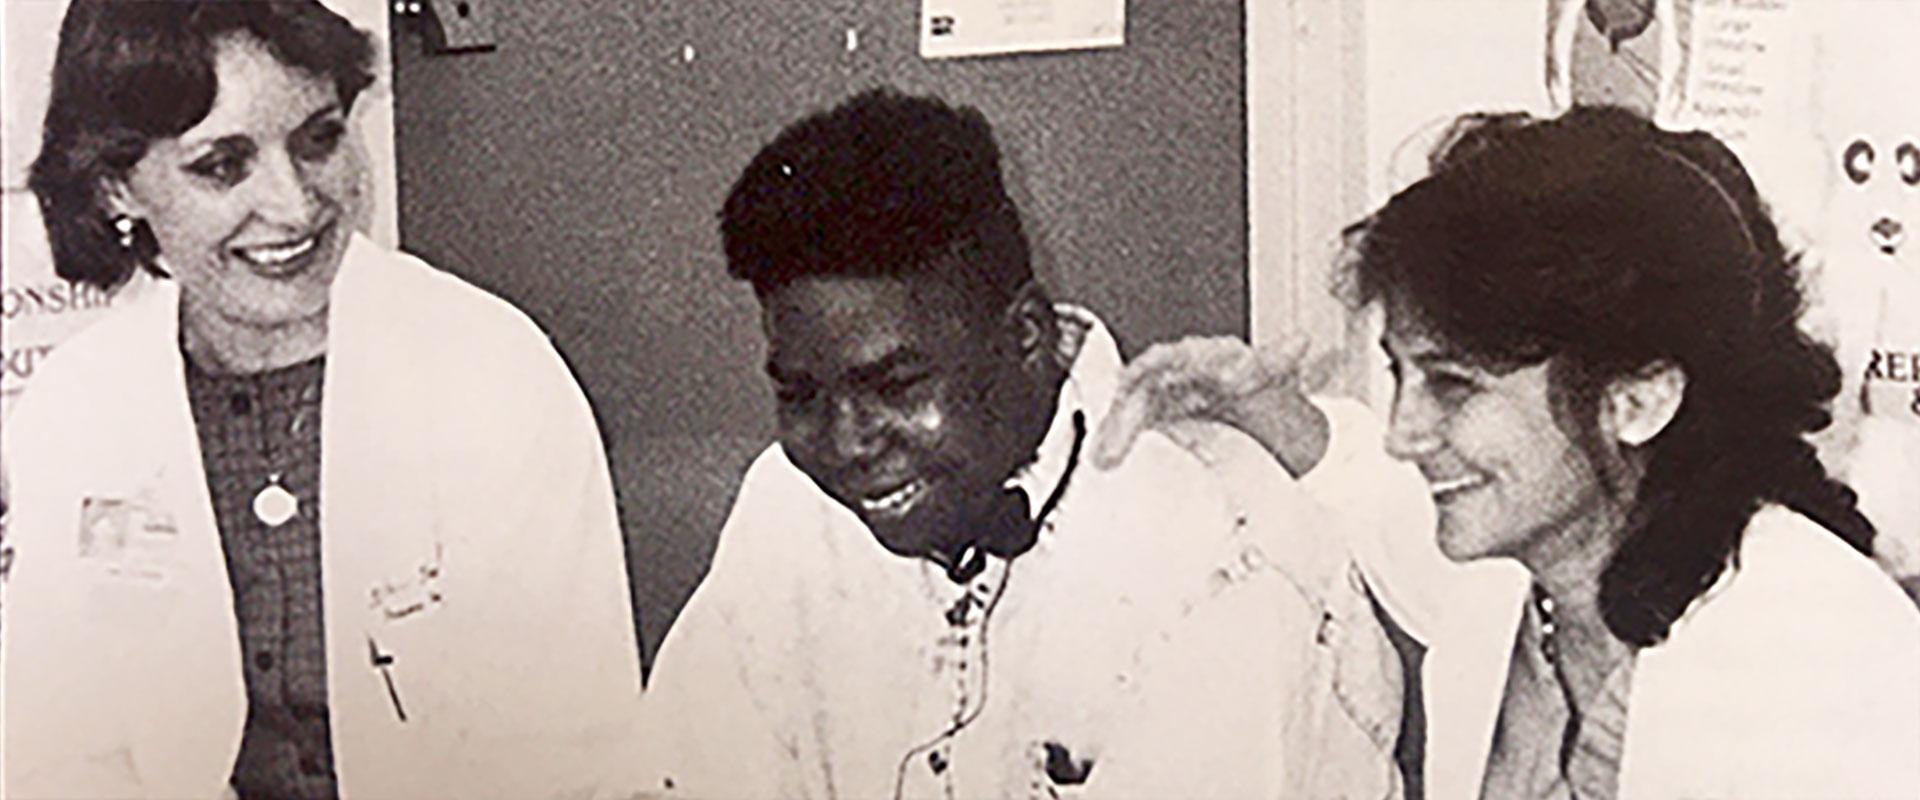 Bruce Brown and Jackson pediatrics heart transplant